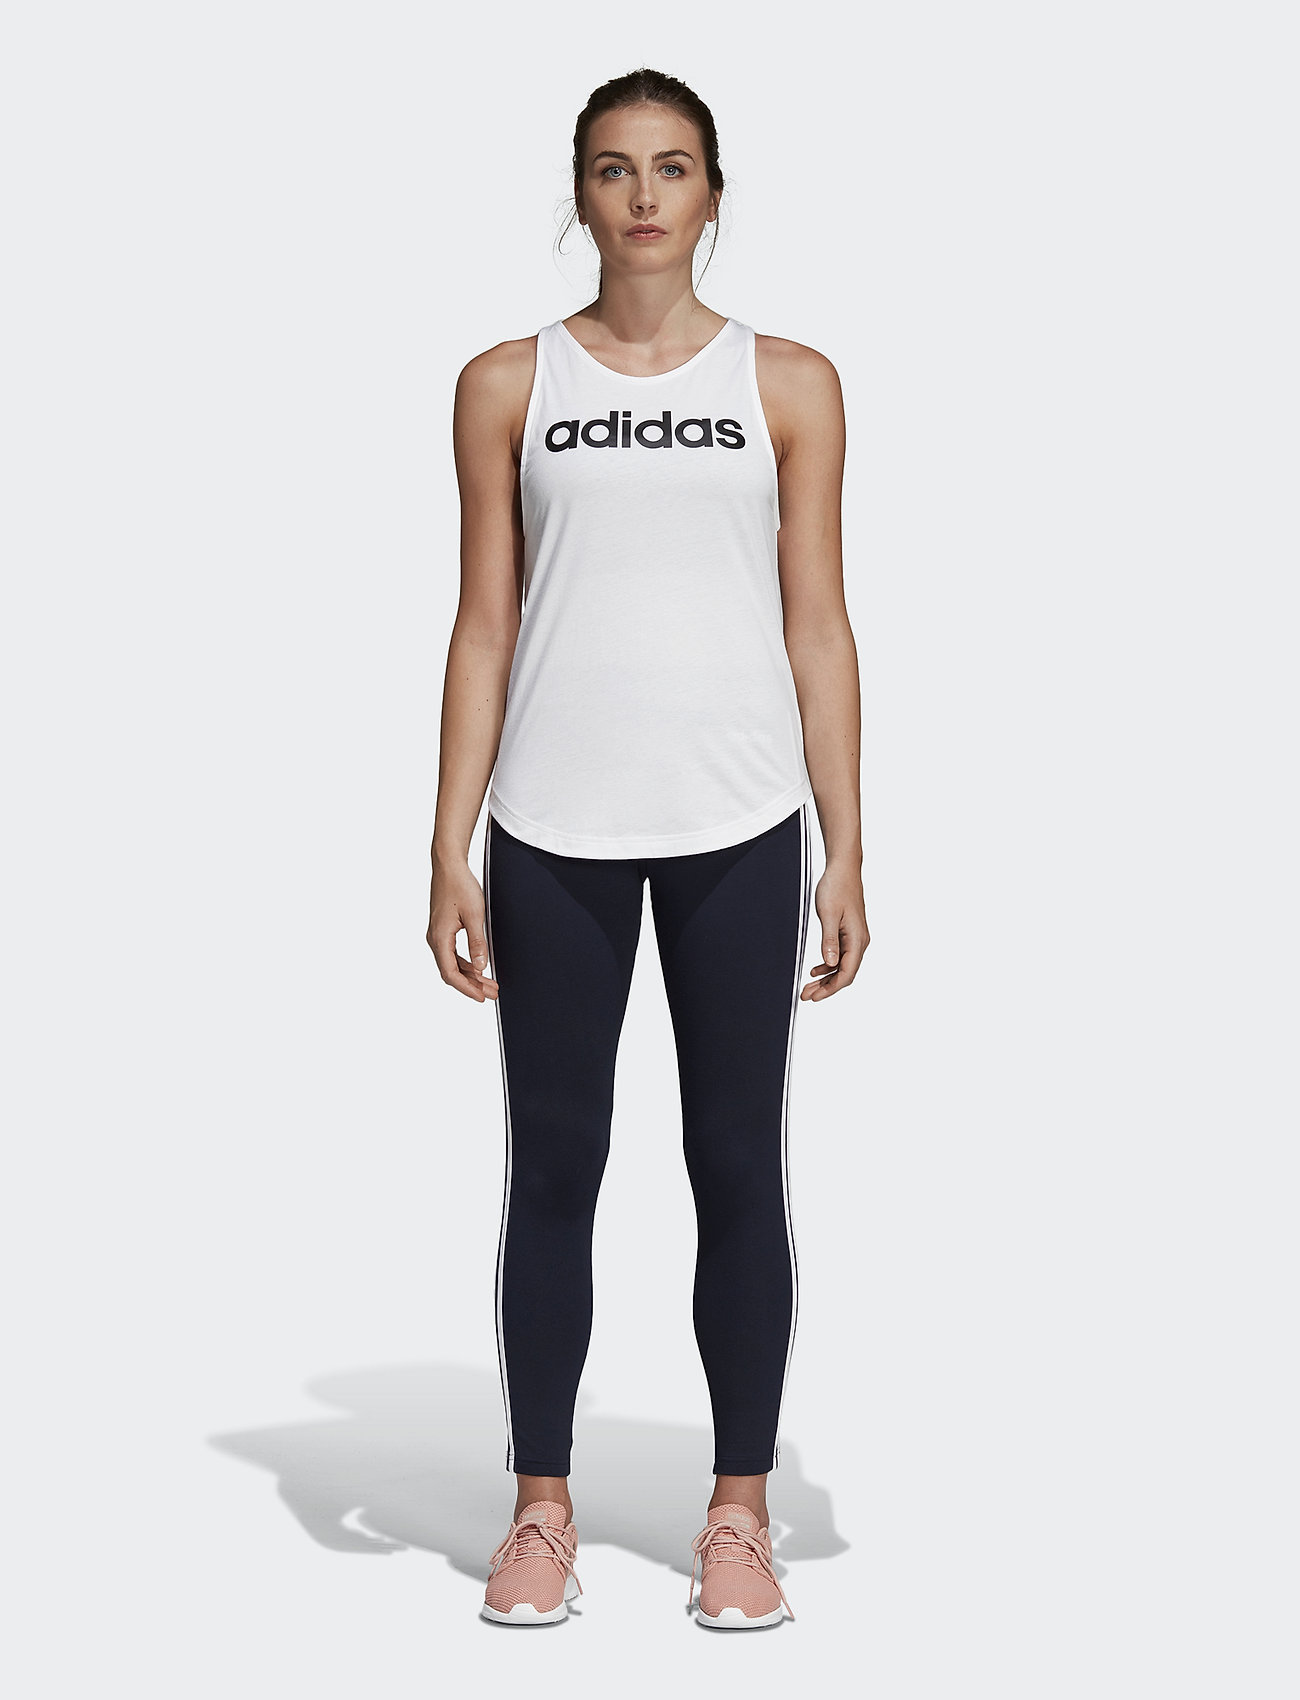 adidas Performance - W E LIN LOOS TK - linnen - white/black - 0